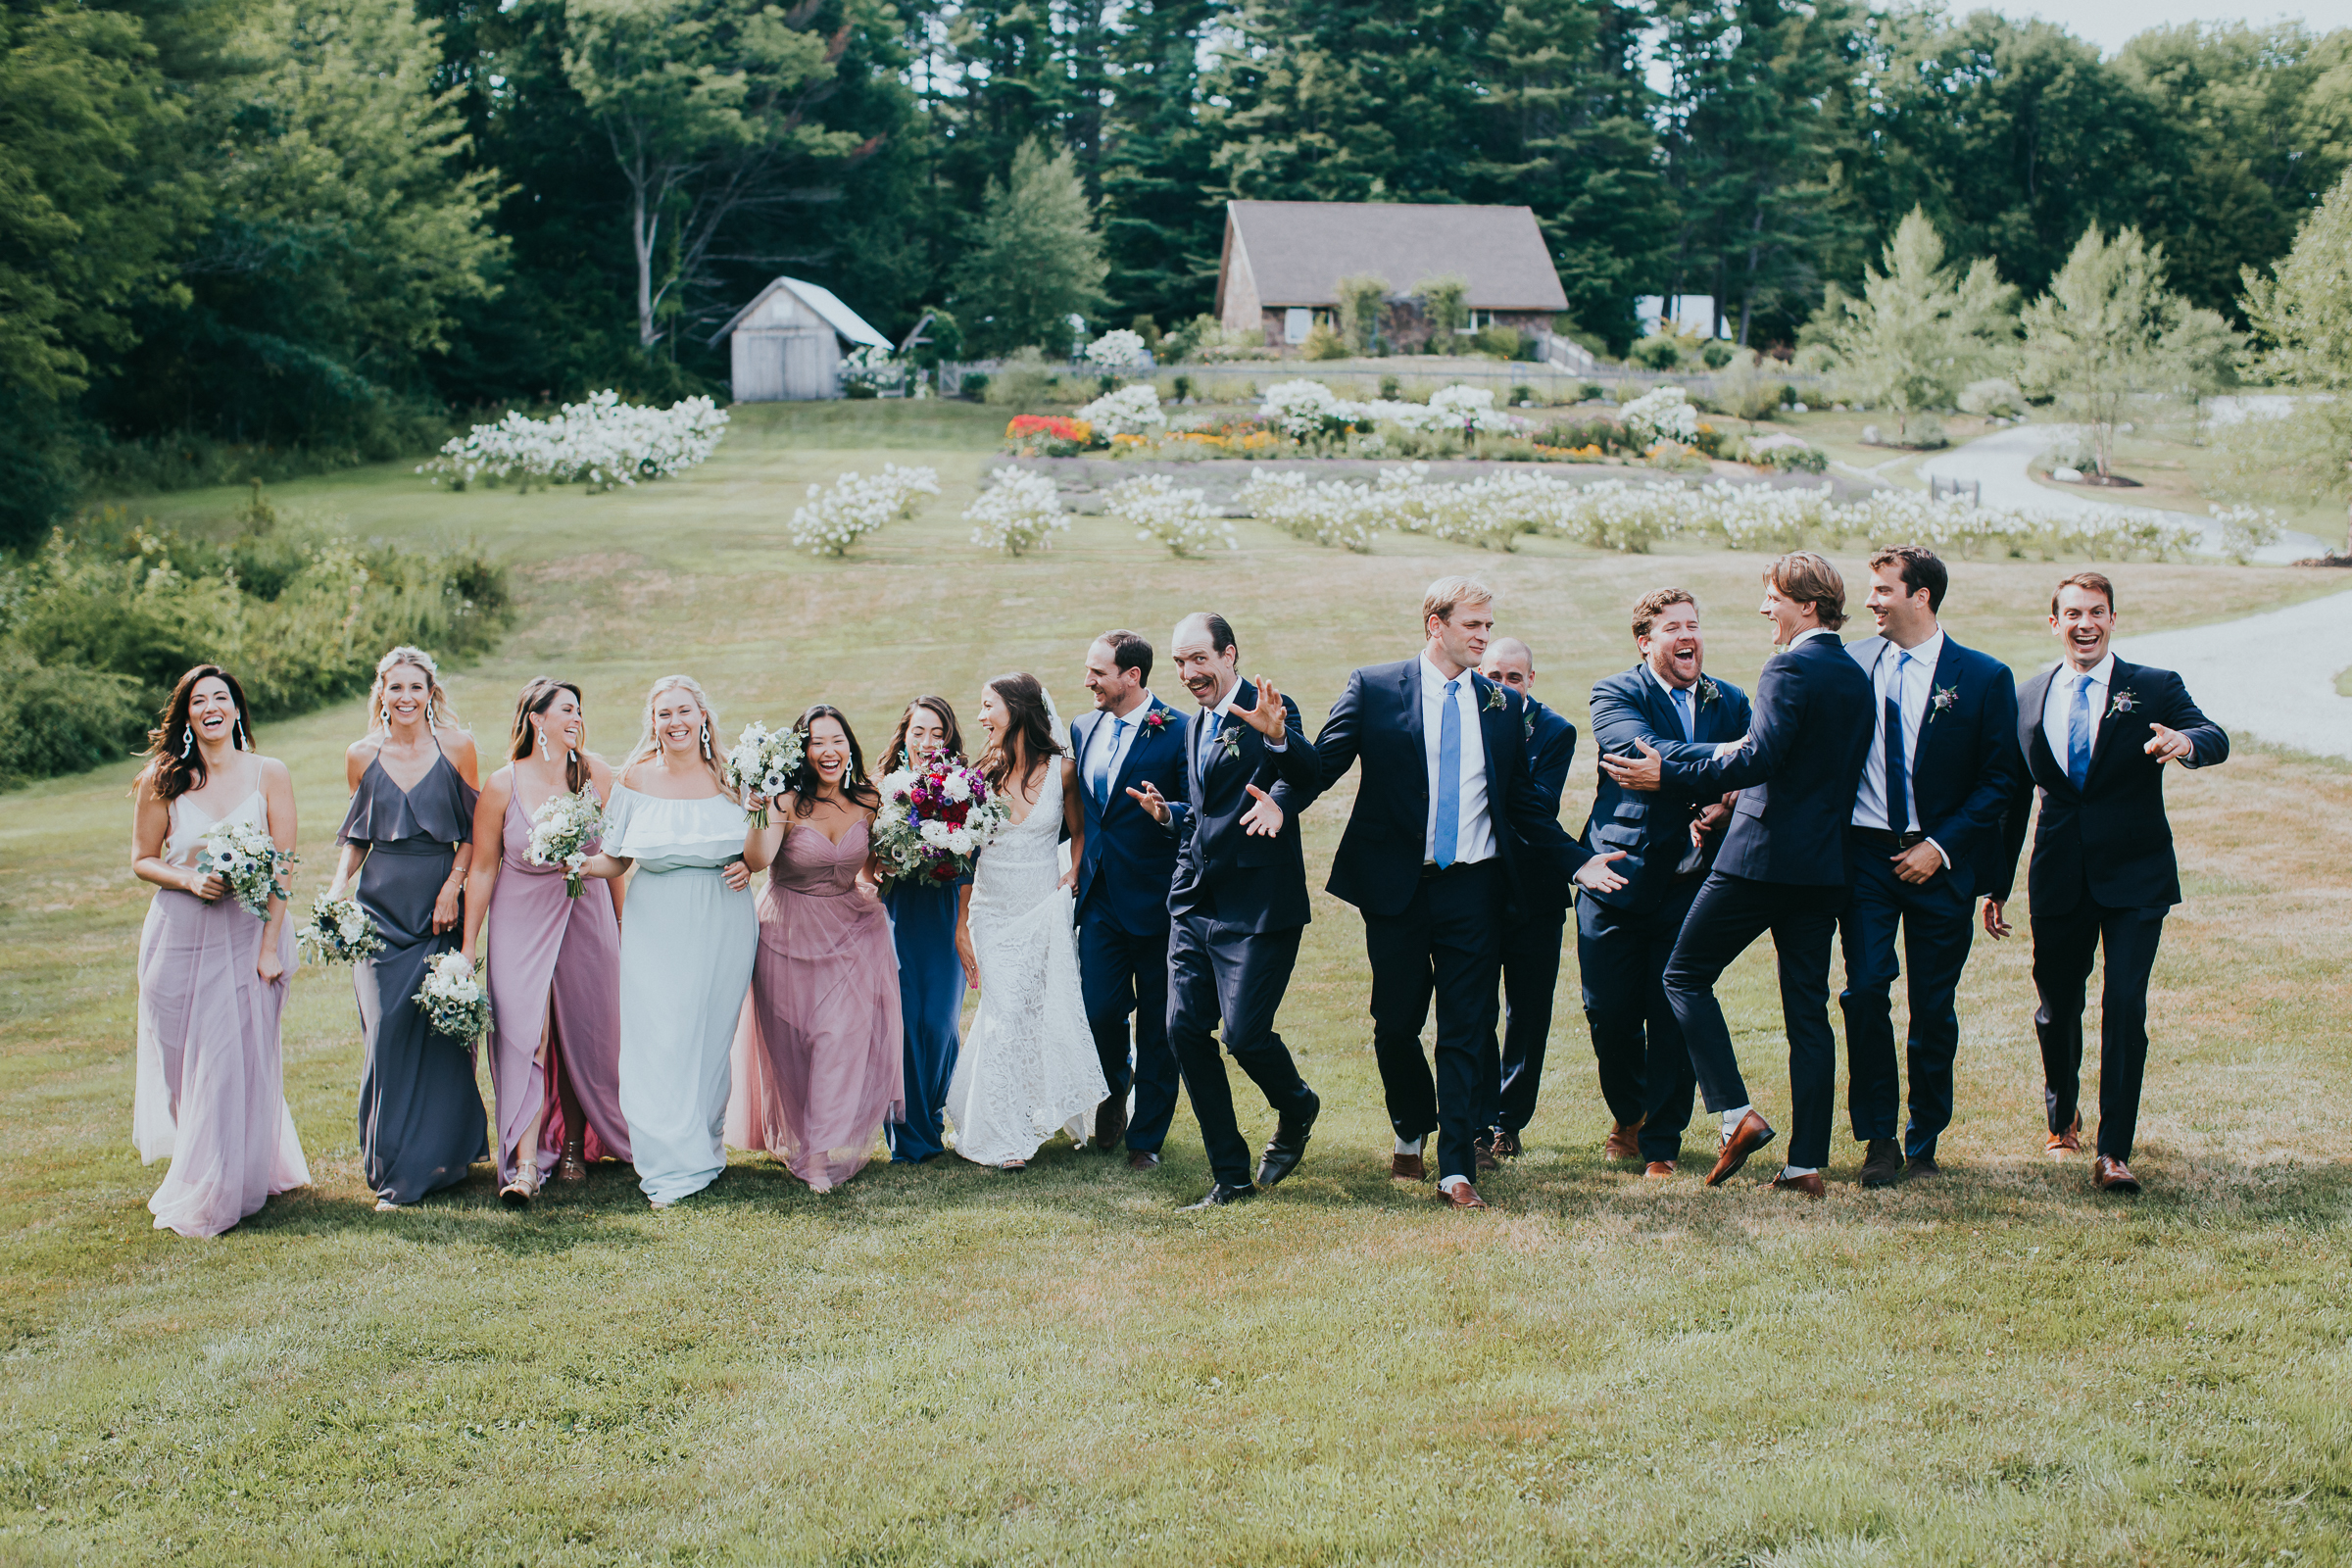 Marianmade-Farm-Wiscasset-Maine-Fine-Art-Documentary-Wedding-Photographer-Elvira-Kalviste-Photography-87.jpg